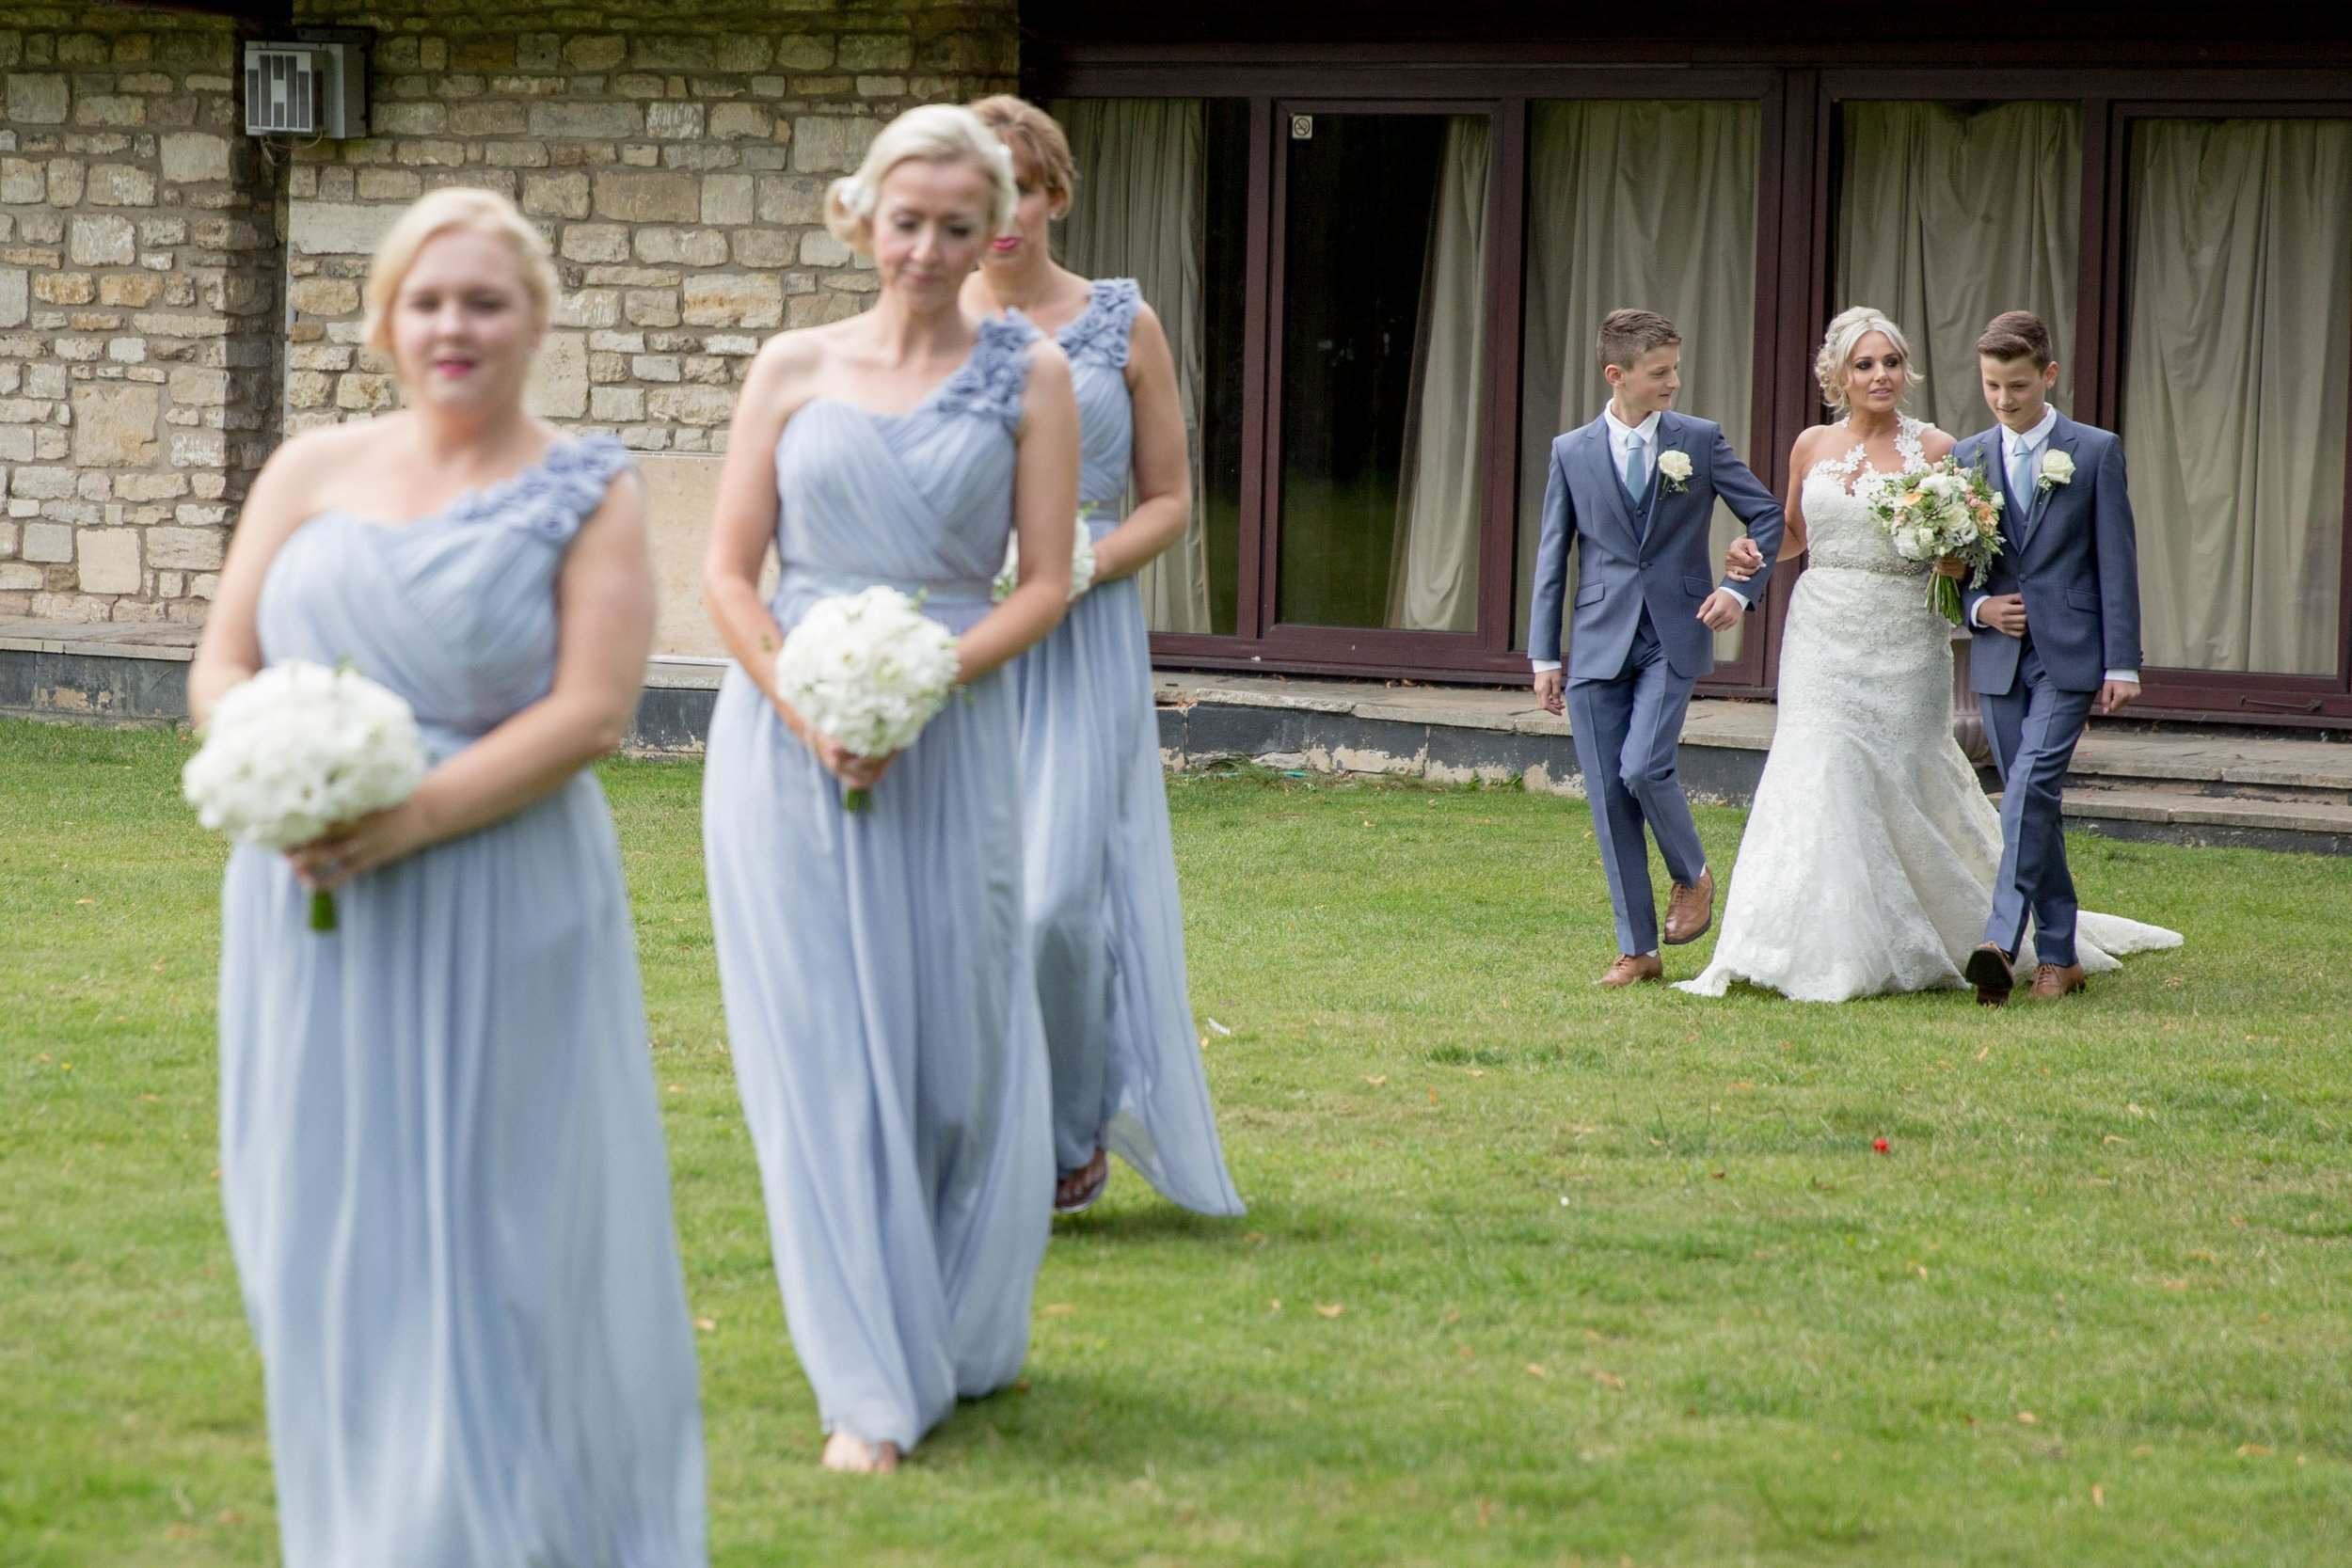 cotswold-wedding-photography-at-stonehouse-court-hotel-natalia-smith-photography-gloucestershire-wedding-photographer-8.jpg